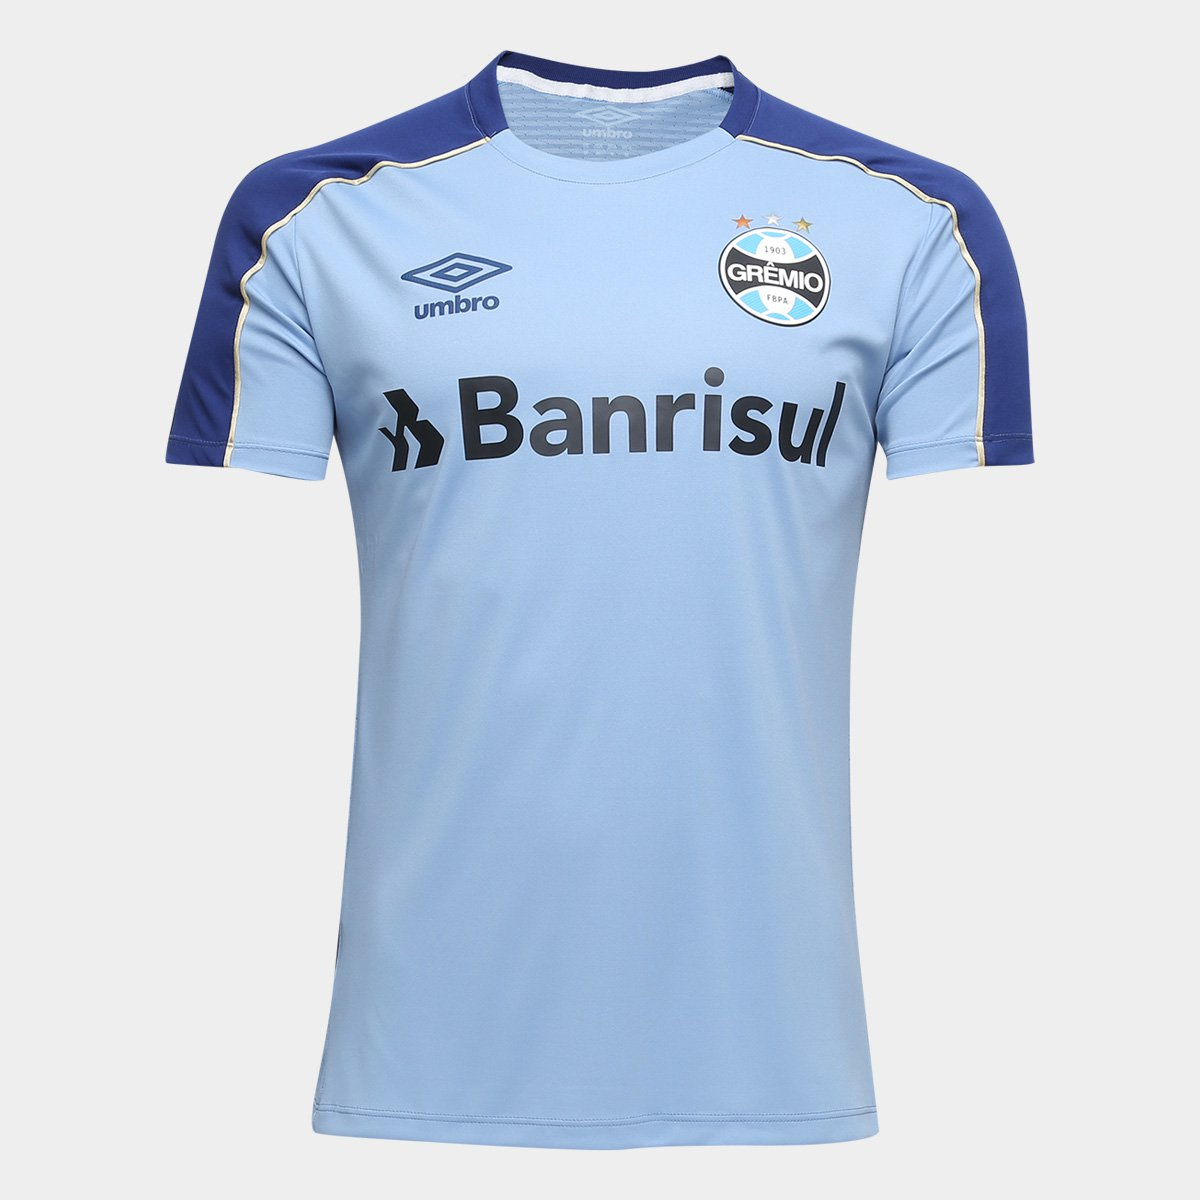 Camisa do Grêmio 2019 Treino Umbro Masculina